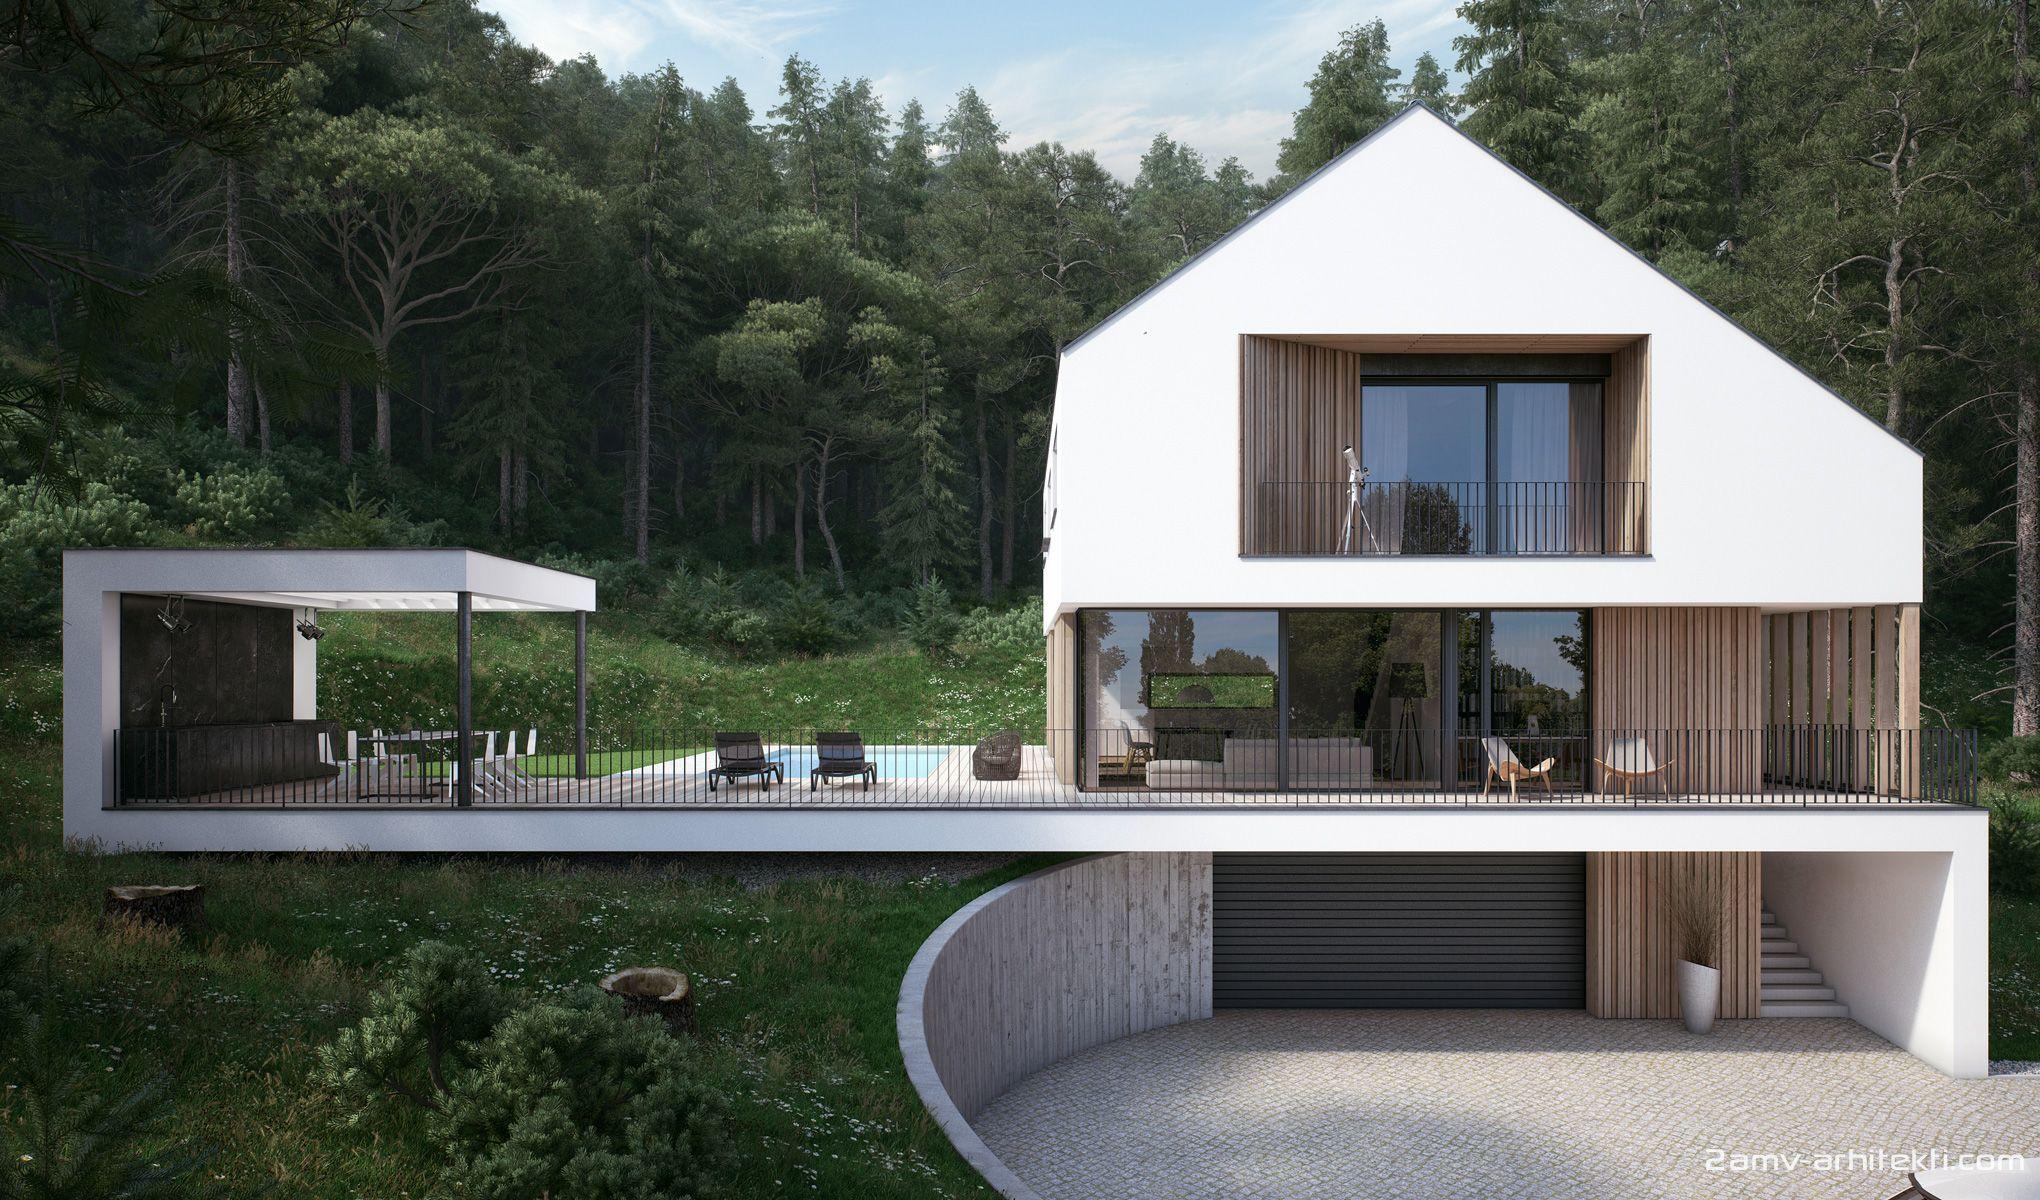 Minimalisticna Sodobna Druzinska Hisa Dgd Strm Teren Montazna Gradnja Xlam Is Part Of Architectu Modern Style House Plans Architecture House Architecture